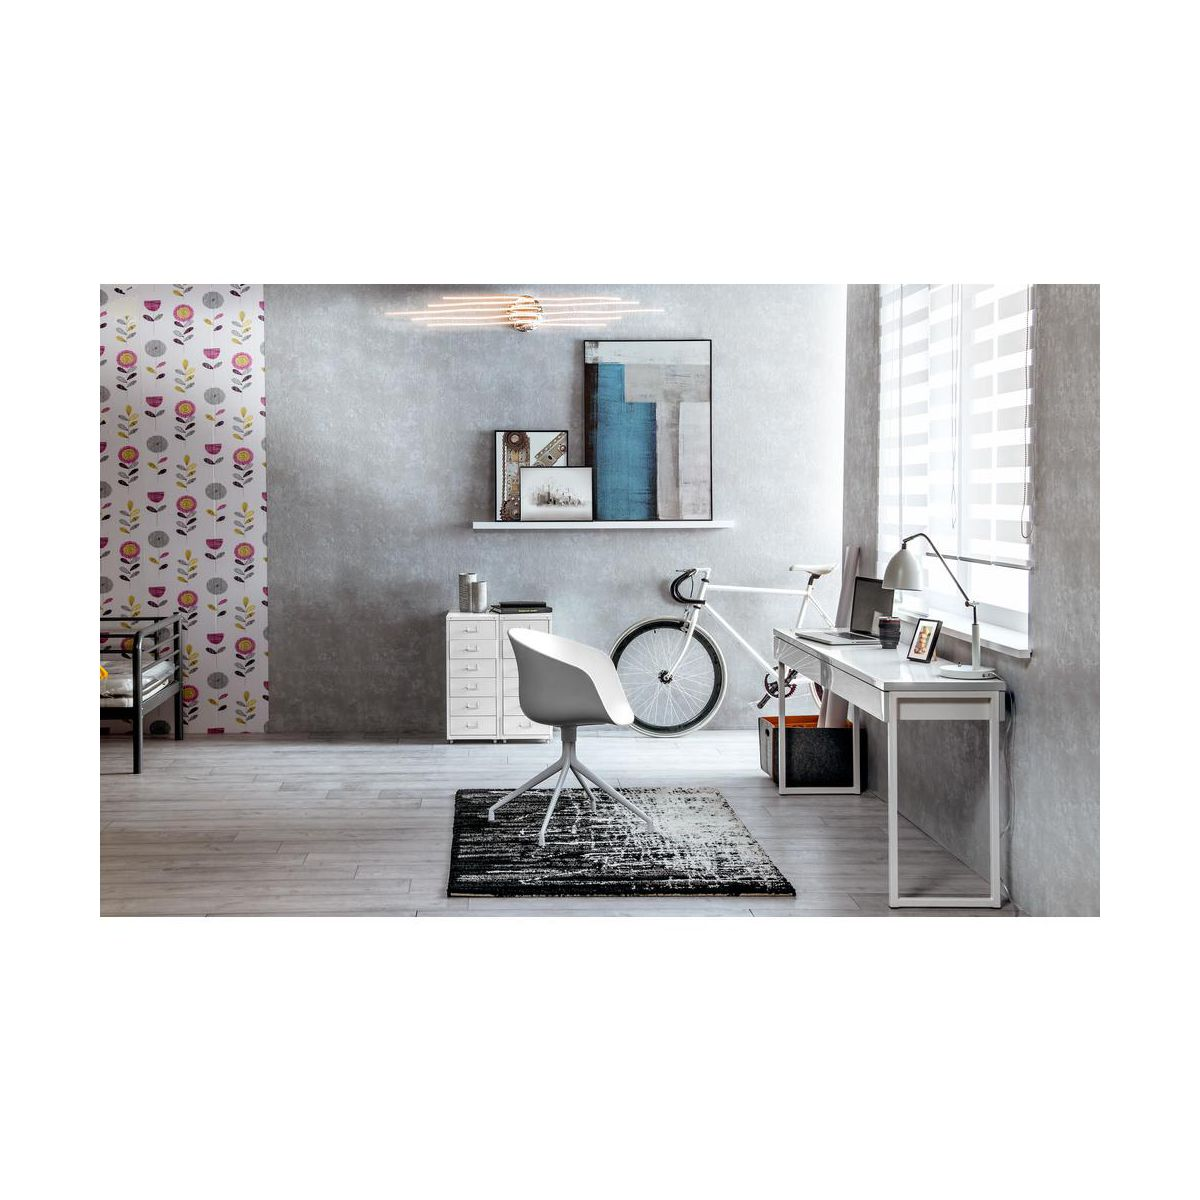 livraison beton leroy merlin maison design. Black Bedroom Furniture Sets. Home Design Ideas